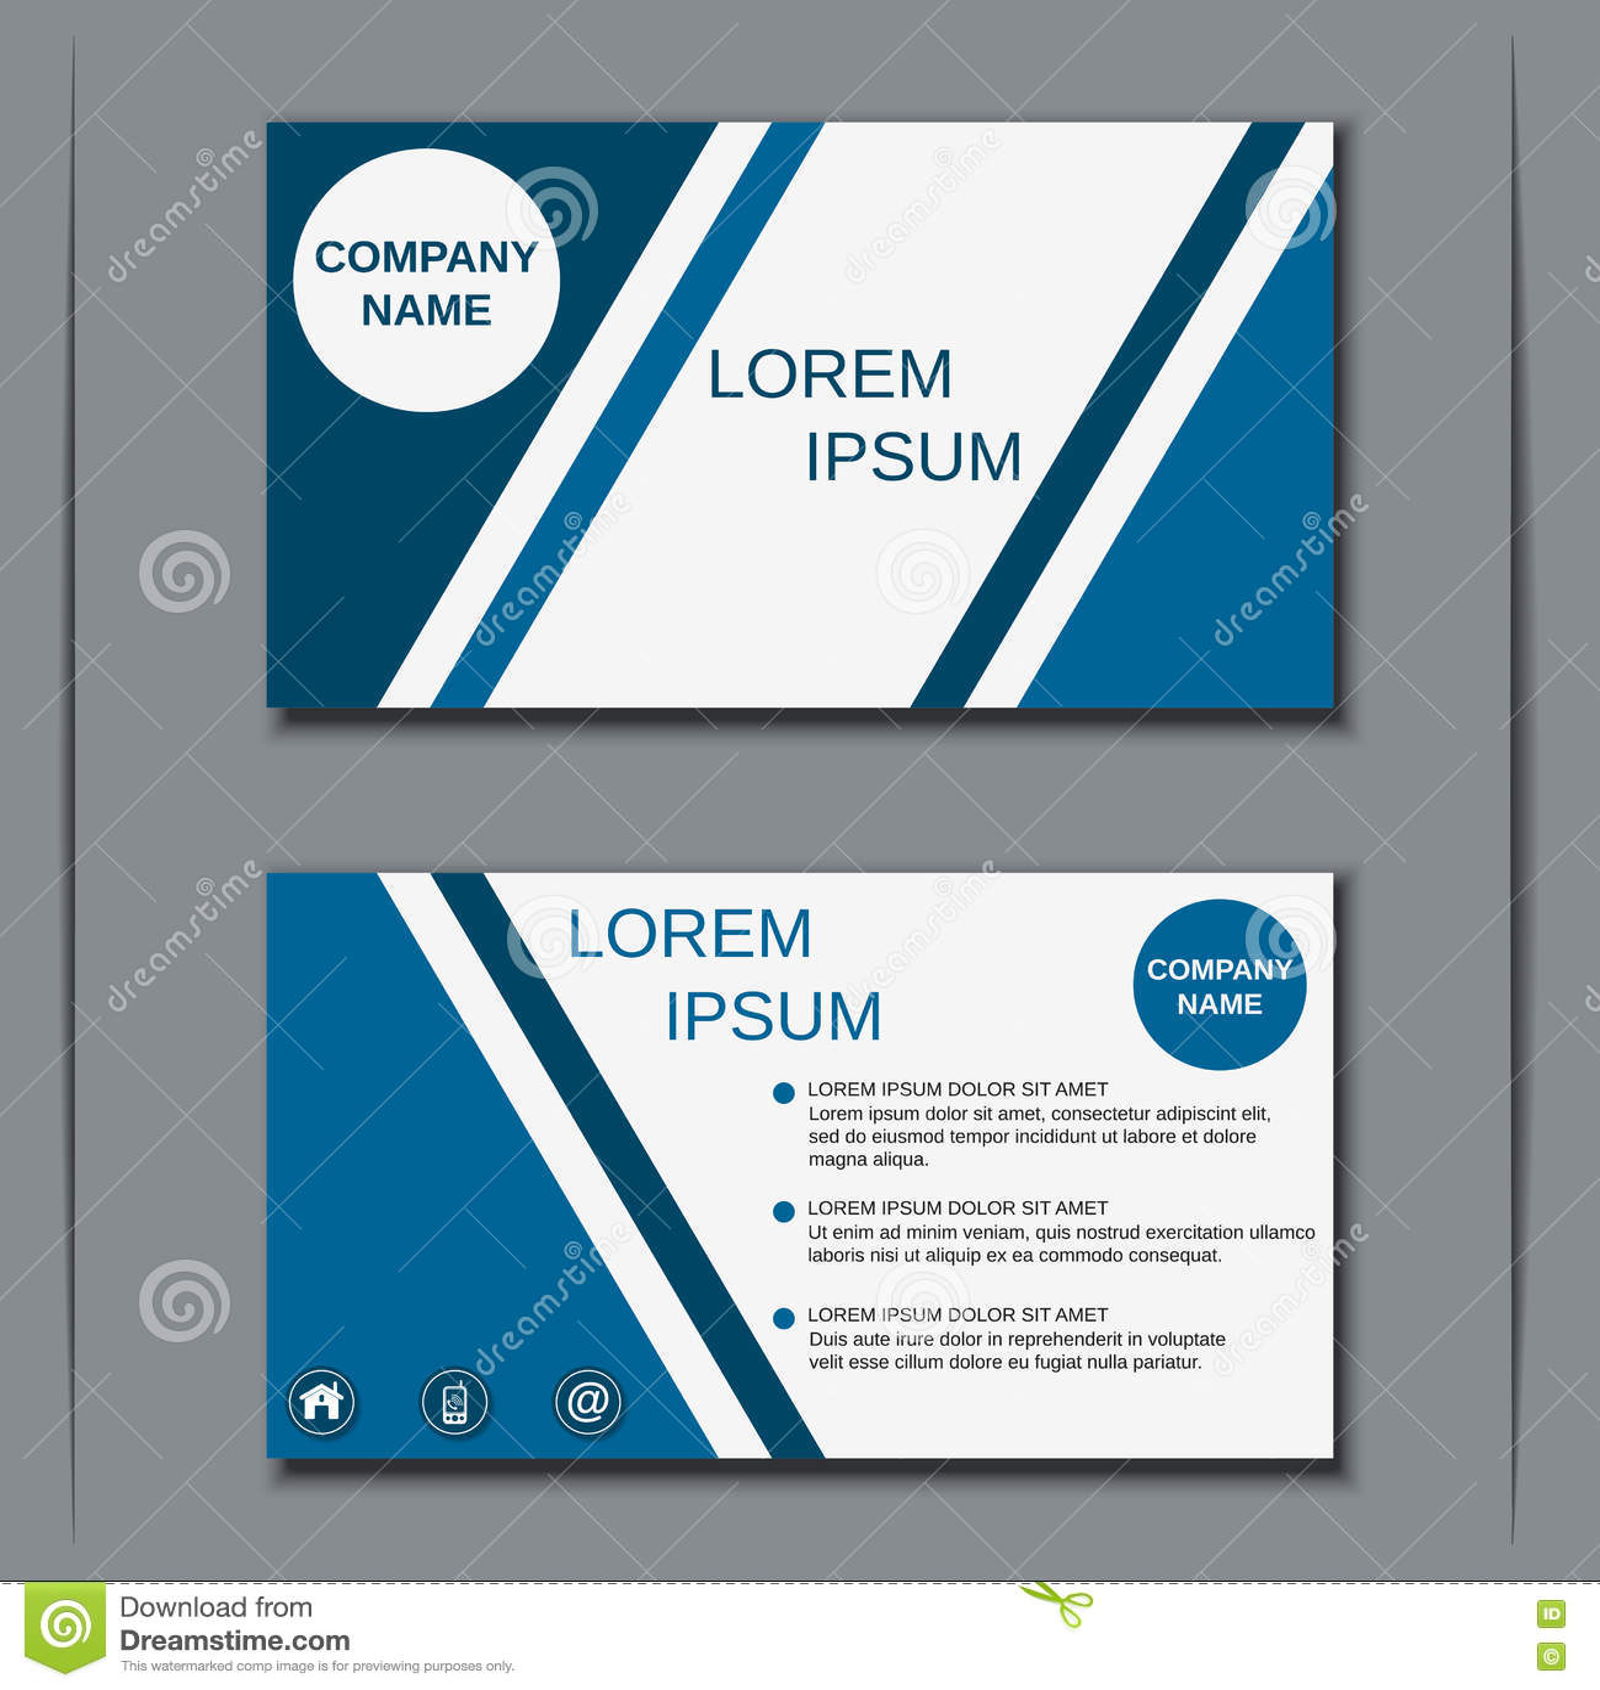 Modern Business Visiting Card Design Stock Vector - Image: 72621833